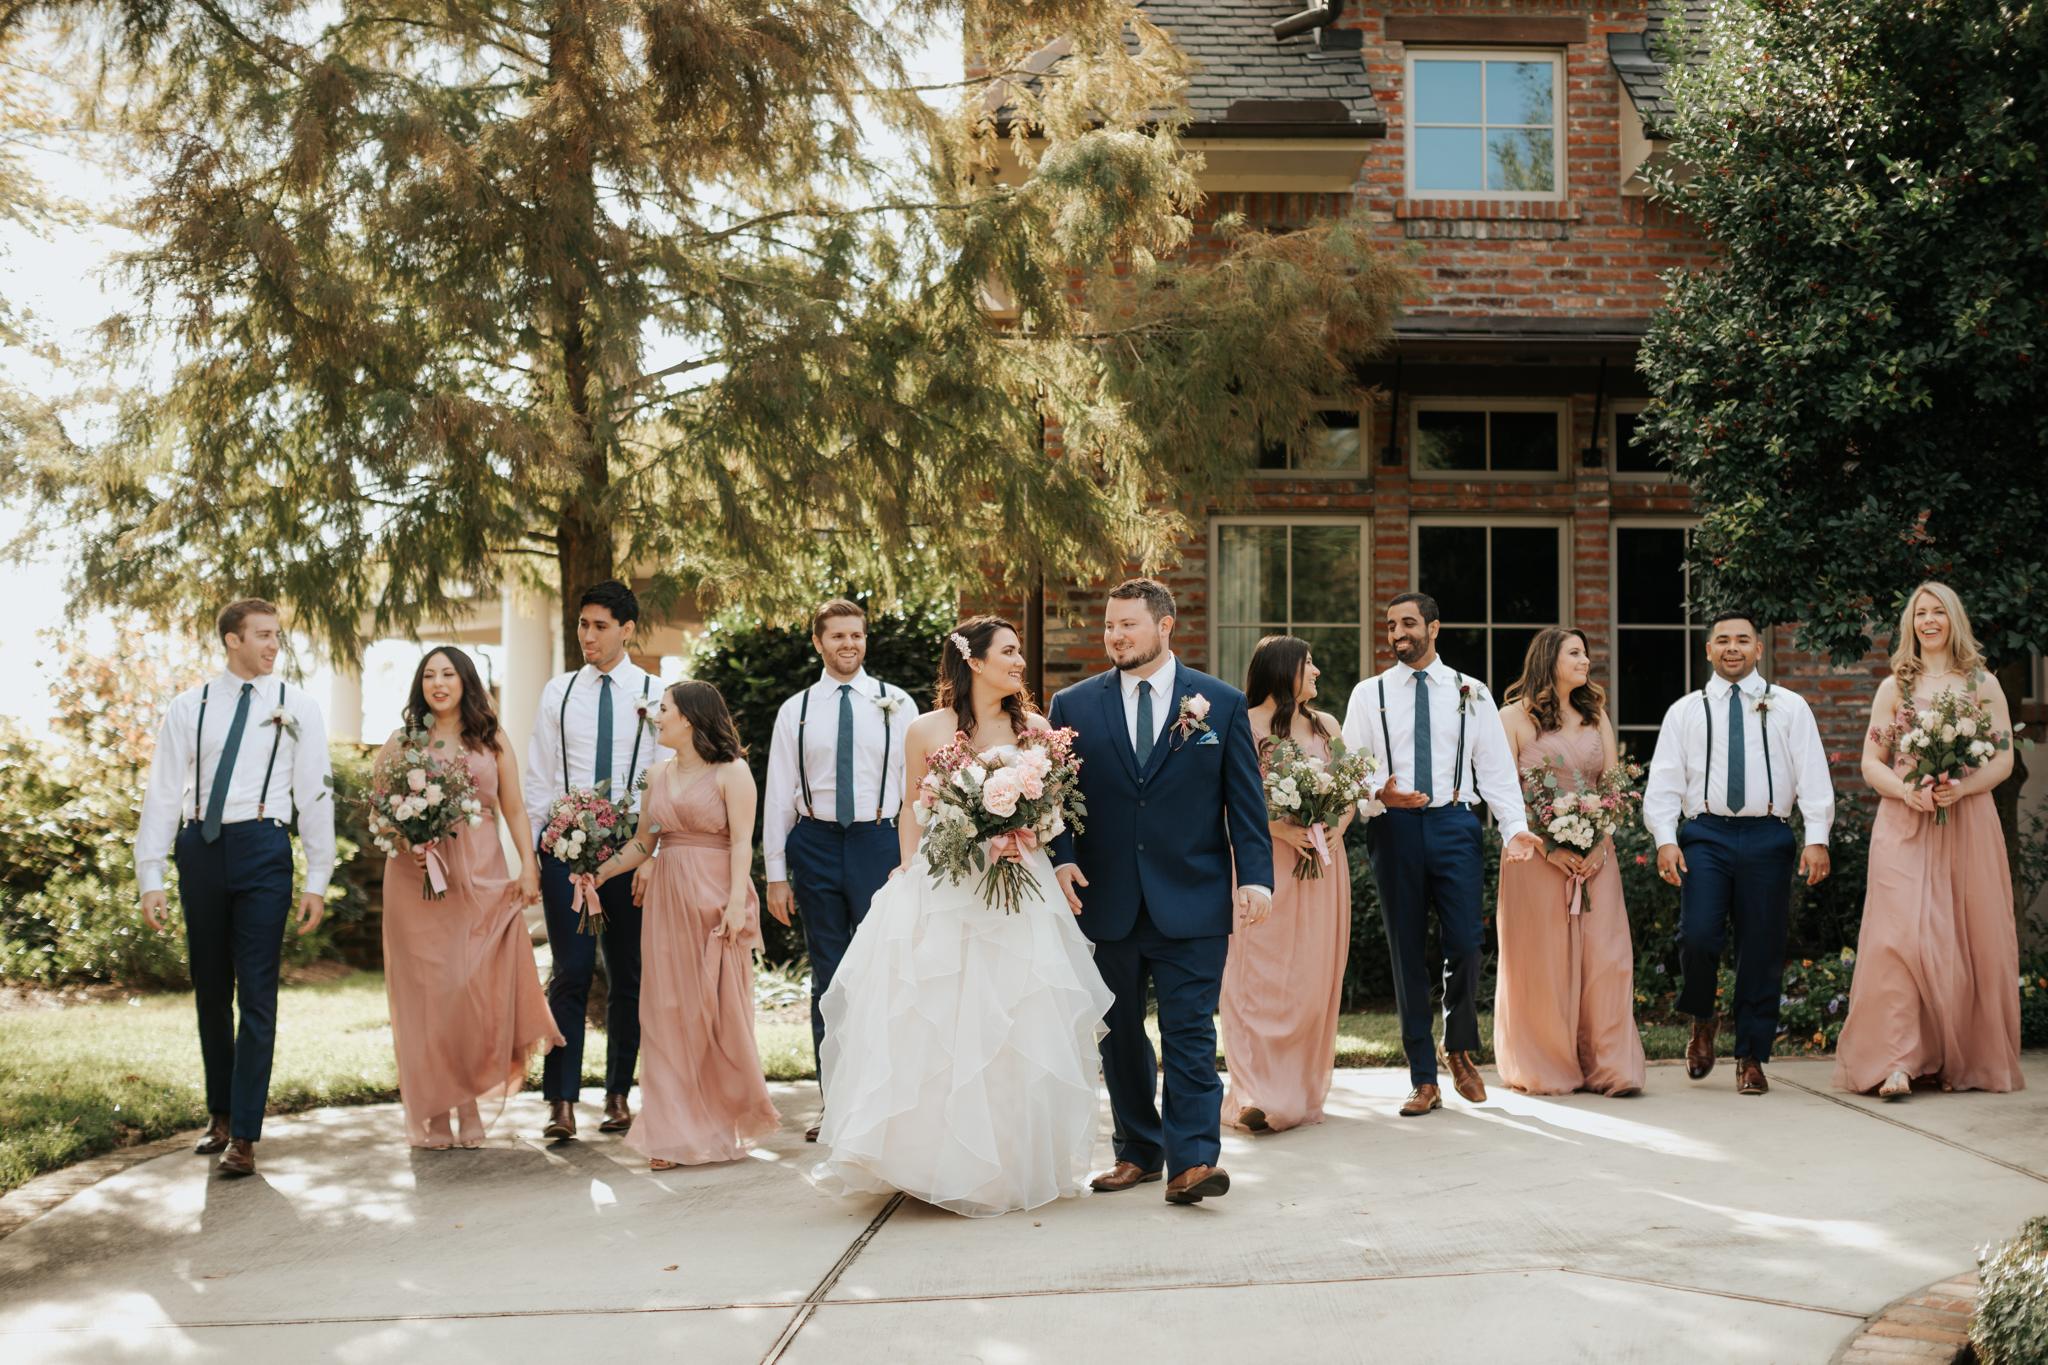 Leah Nicole Photography - Houston Wedding Photographer-Lake Conroe Wedding- Houston Wedding Photographer-19.jpg